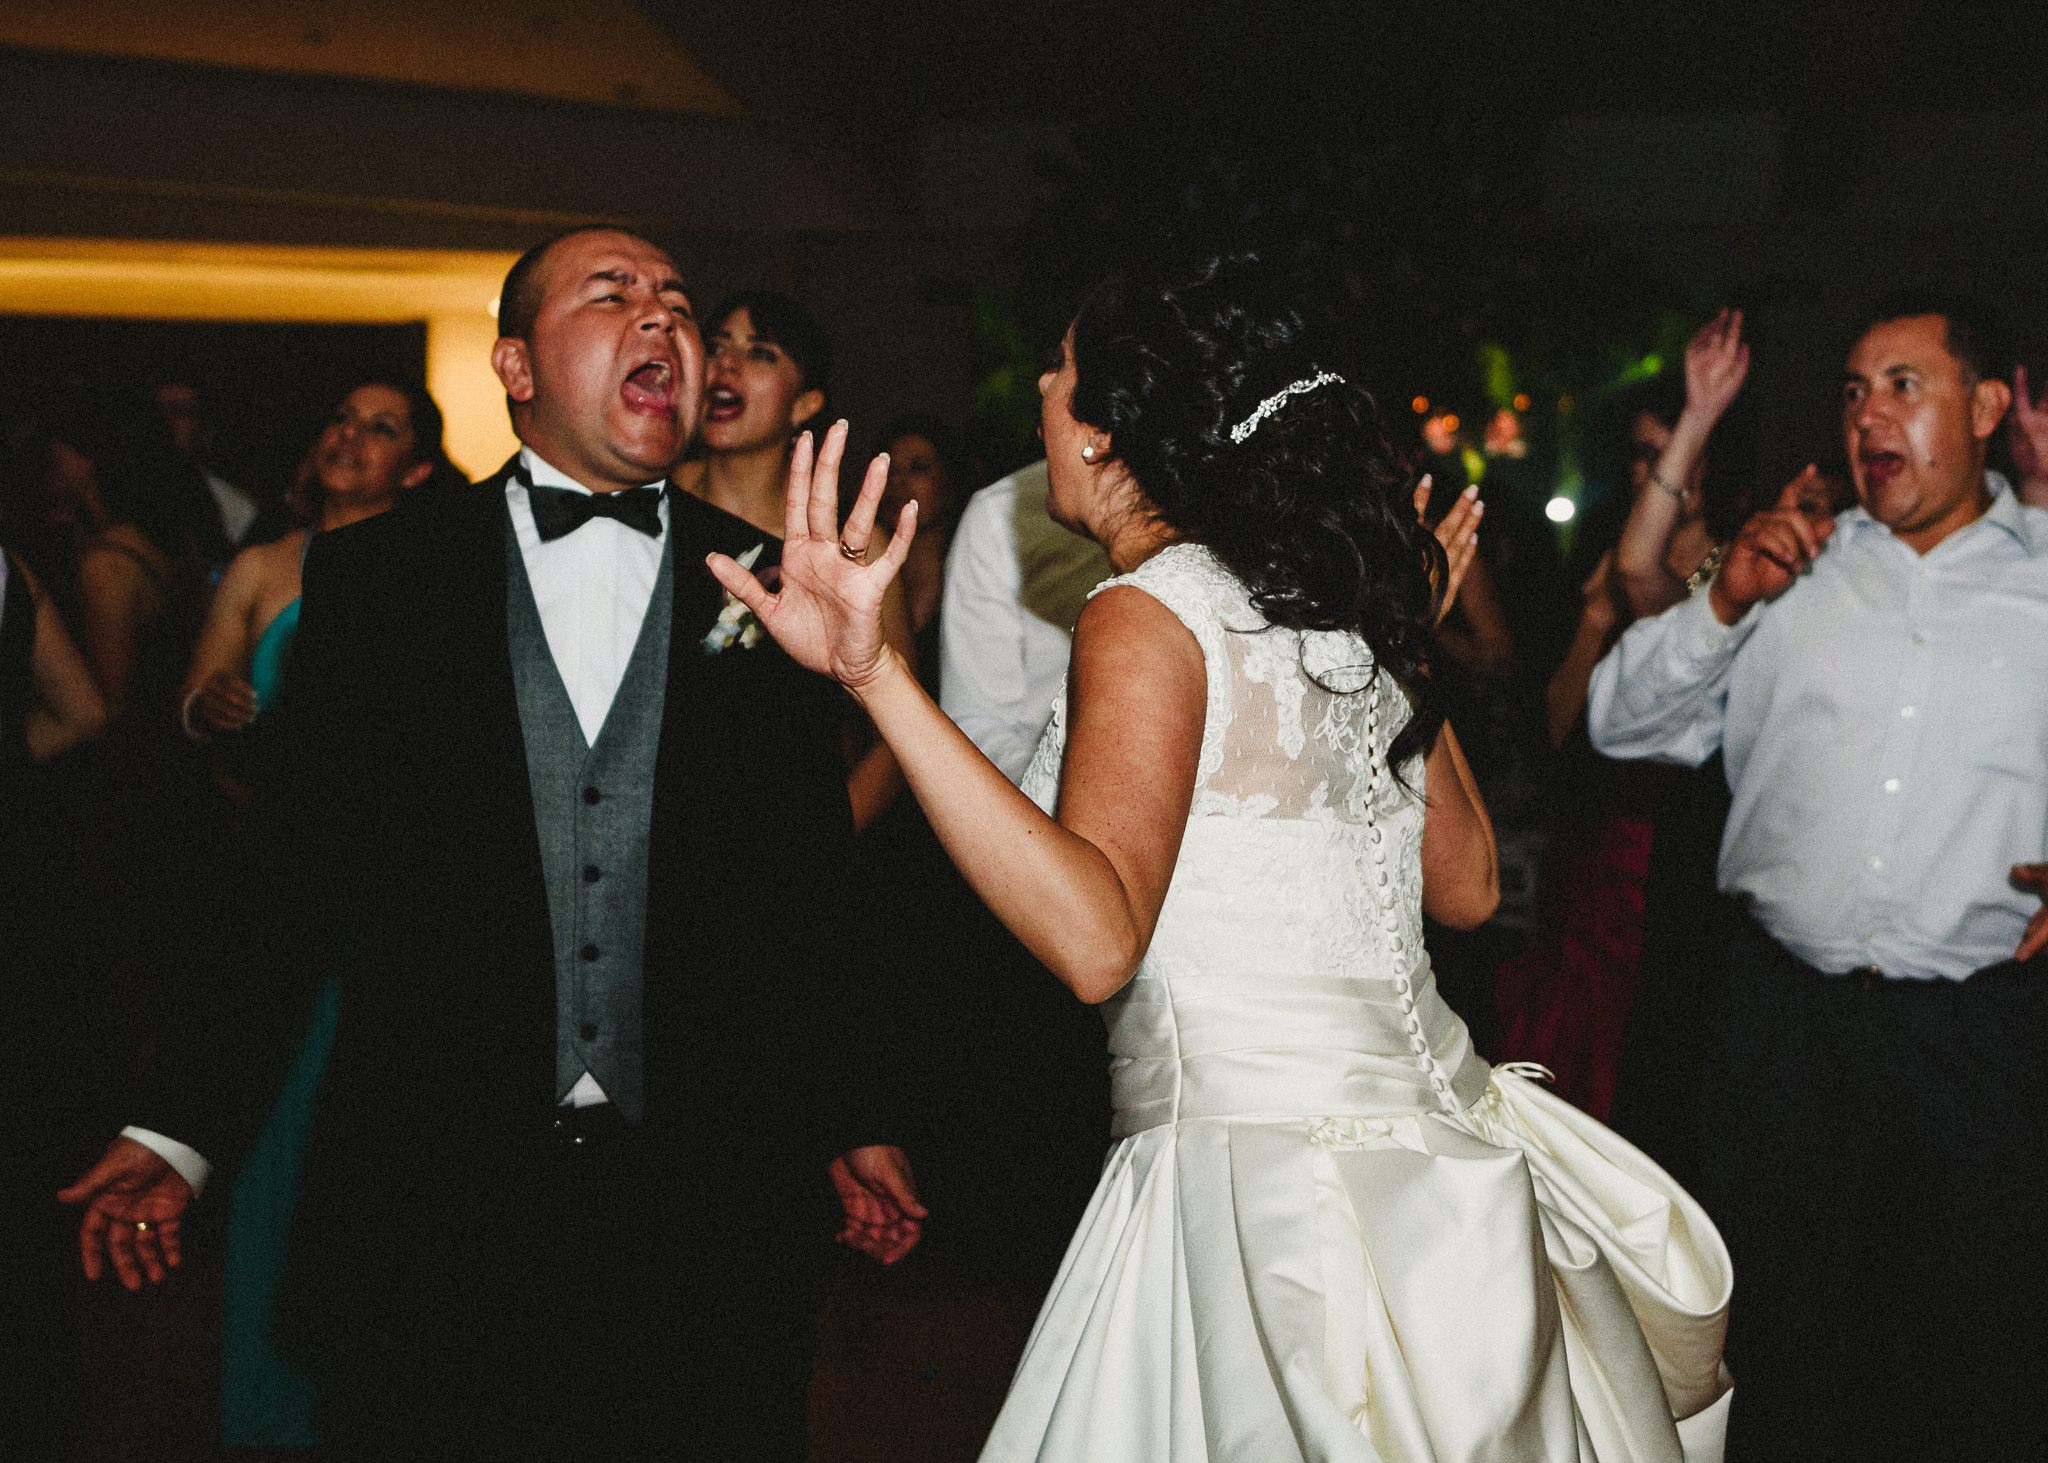 Wedding-Boda-Tulancingo-Hidalgo-Salon-Essenzia-Luis-Houdin-84-film